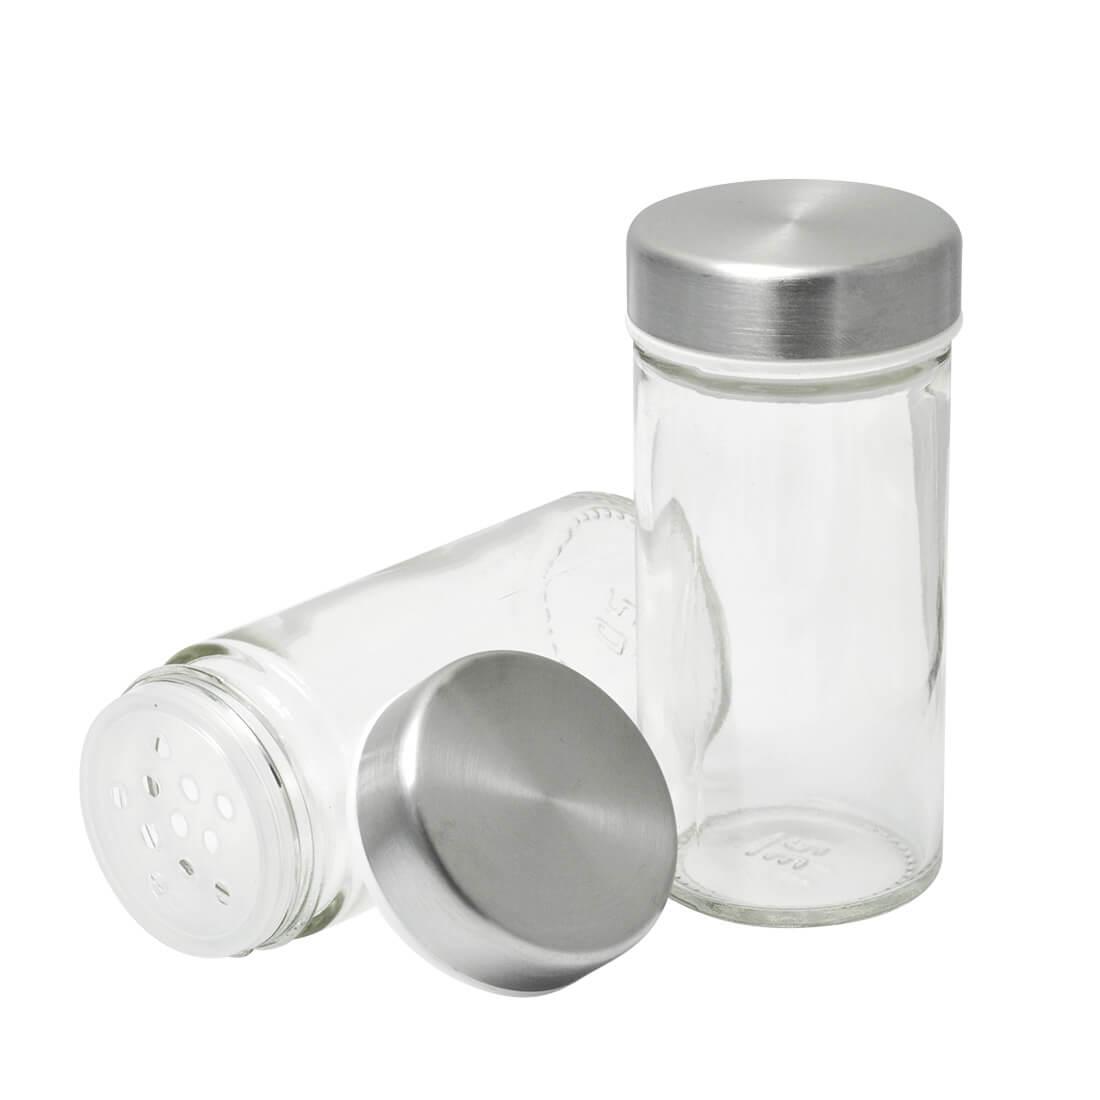 Porta Tempero Condimento Aço Inox Giratório 12 Potes